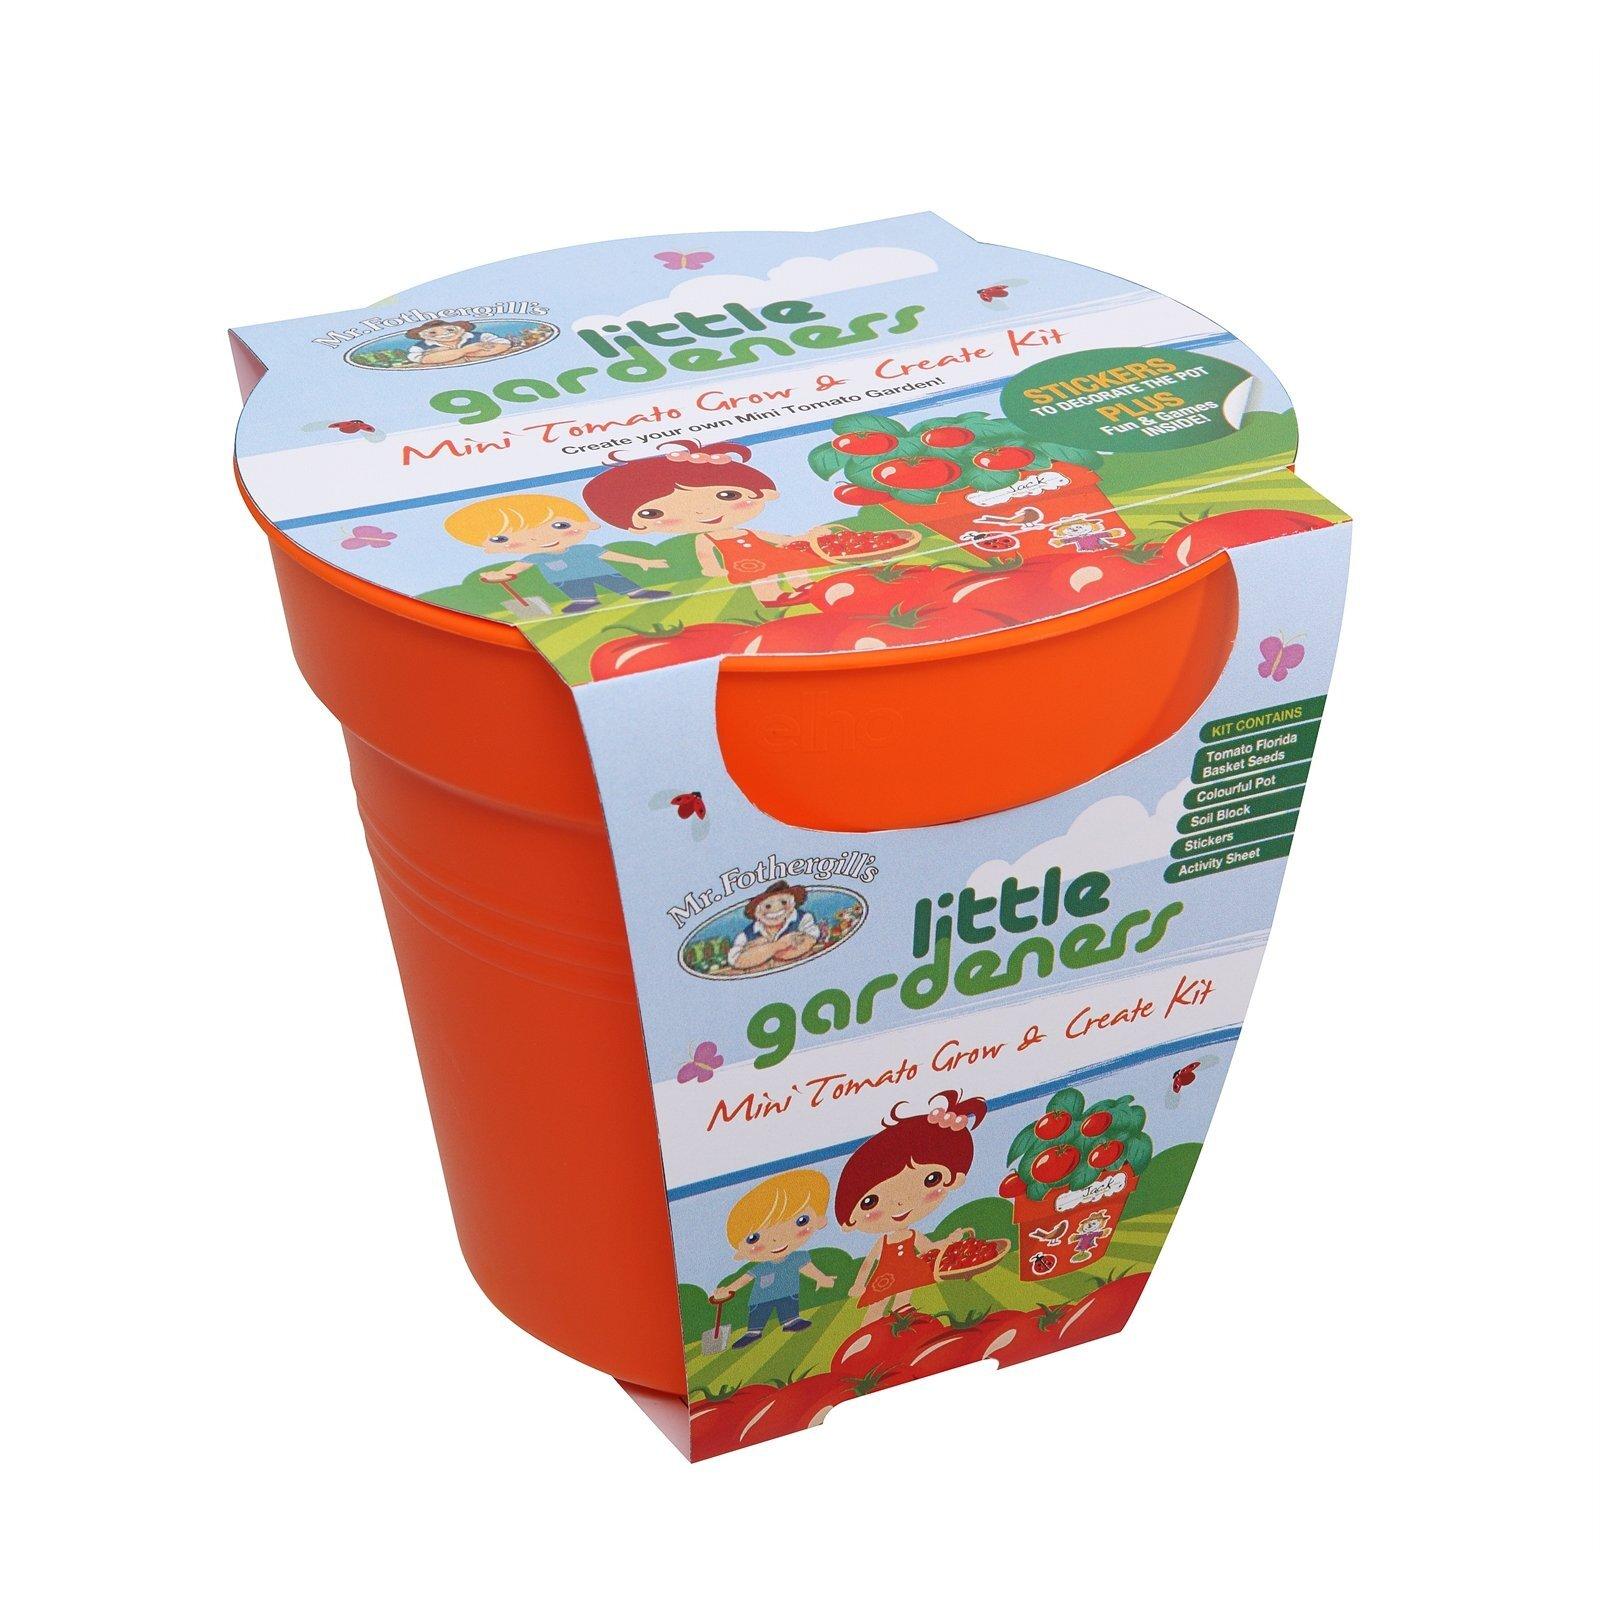 Mr Fothergill's Little Gardeners Mini Tomato Grow And Create Kit